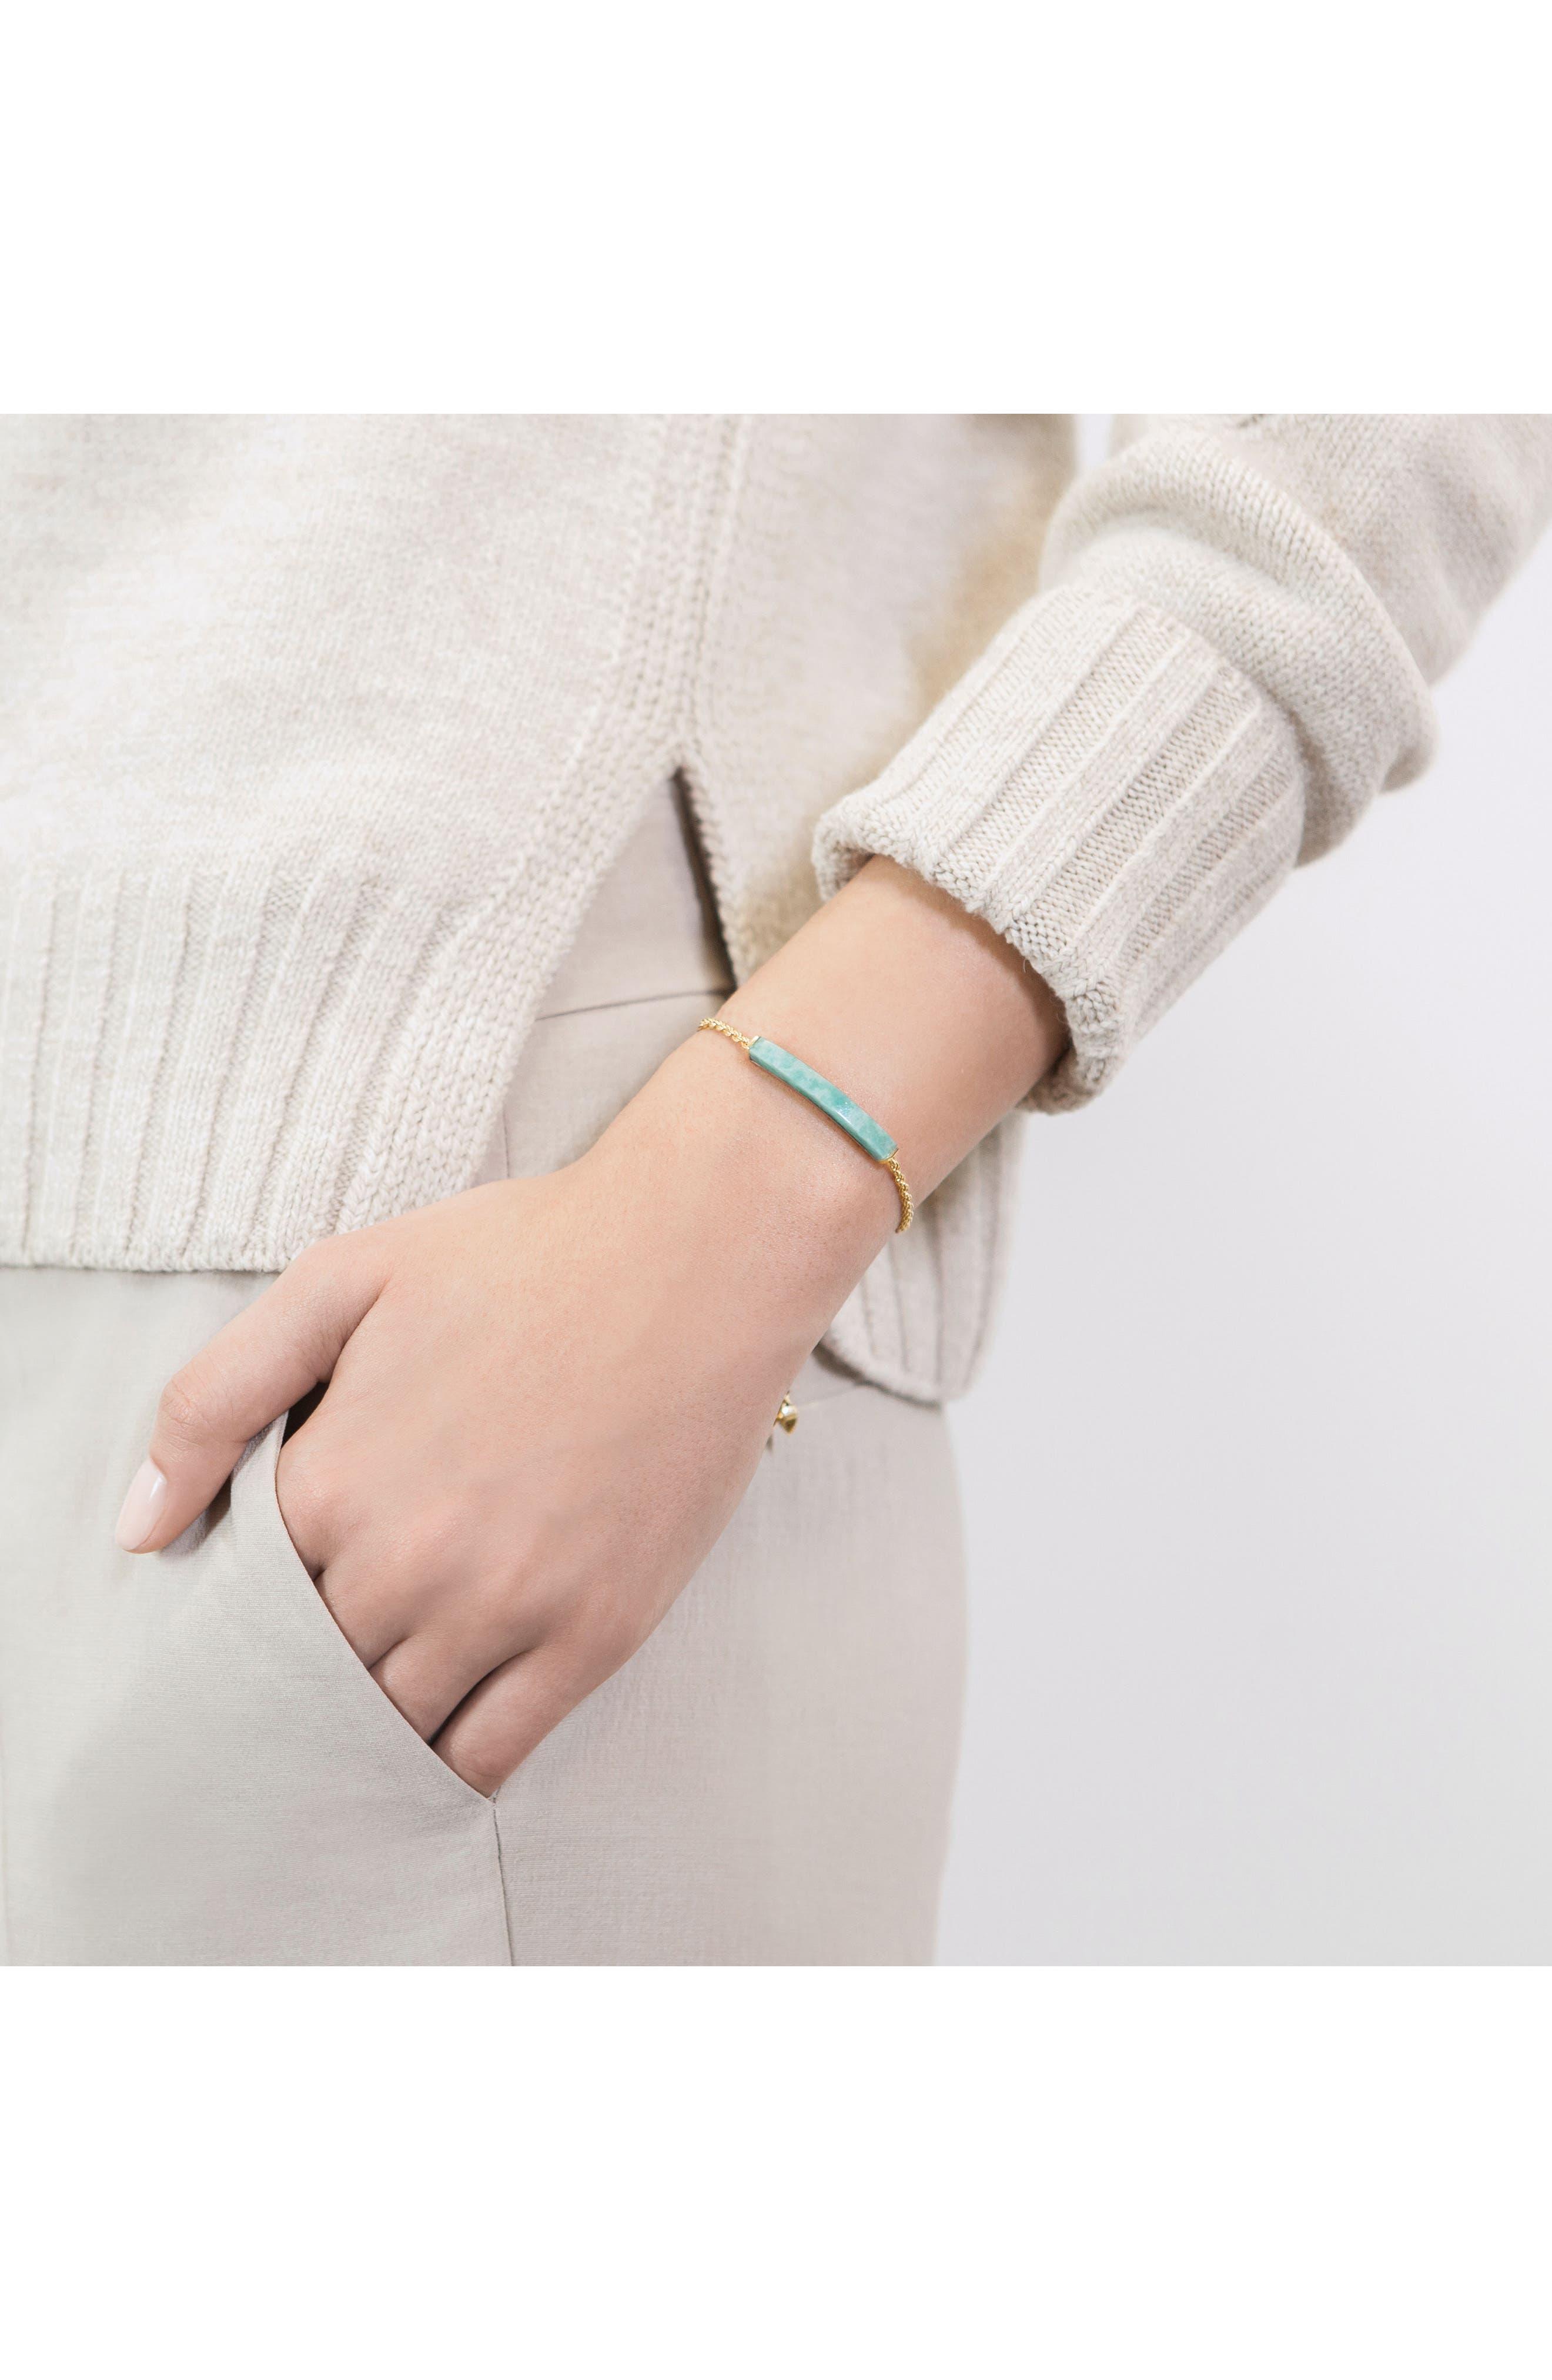 Linear Semiprecious Stone Friendship Bracelet,                             Alternate thumbnail 2, color,                             GOLD/ AMAZONITE